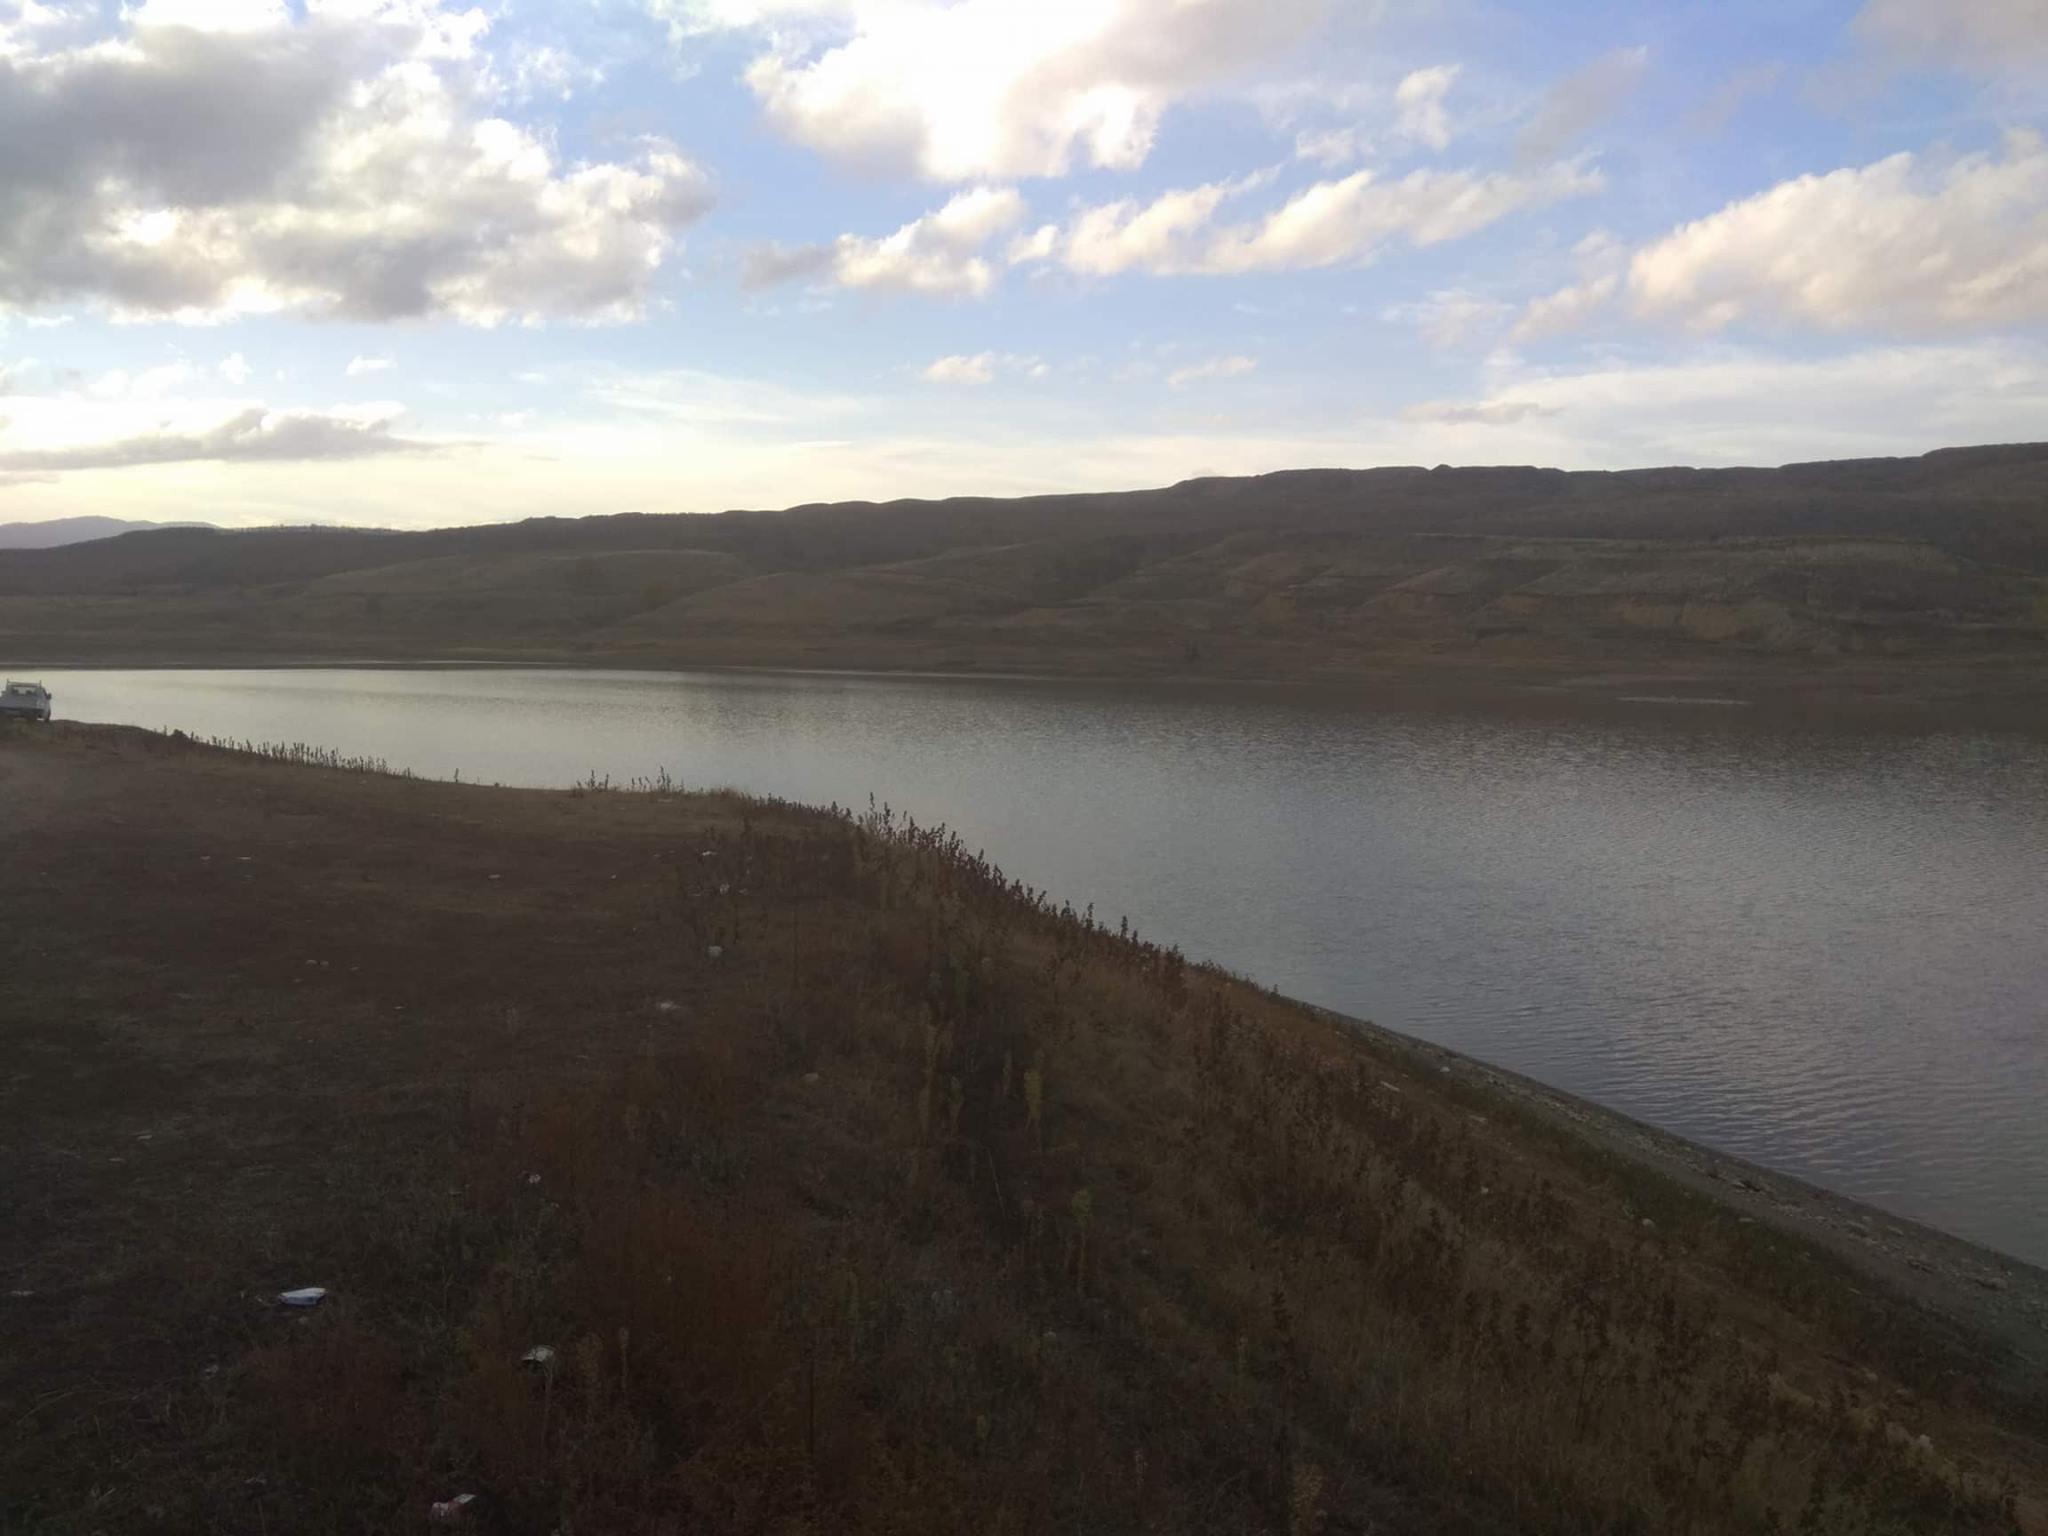 kozan.gr: Χαμηλά επίπεδα στάθμης και στη λίμνη στο Φράγμα Περδίκκα (Βίντεο & Φωτογραφίες)